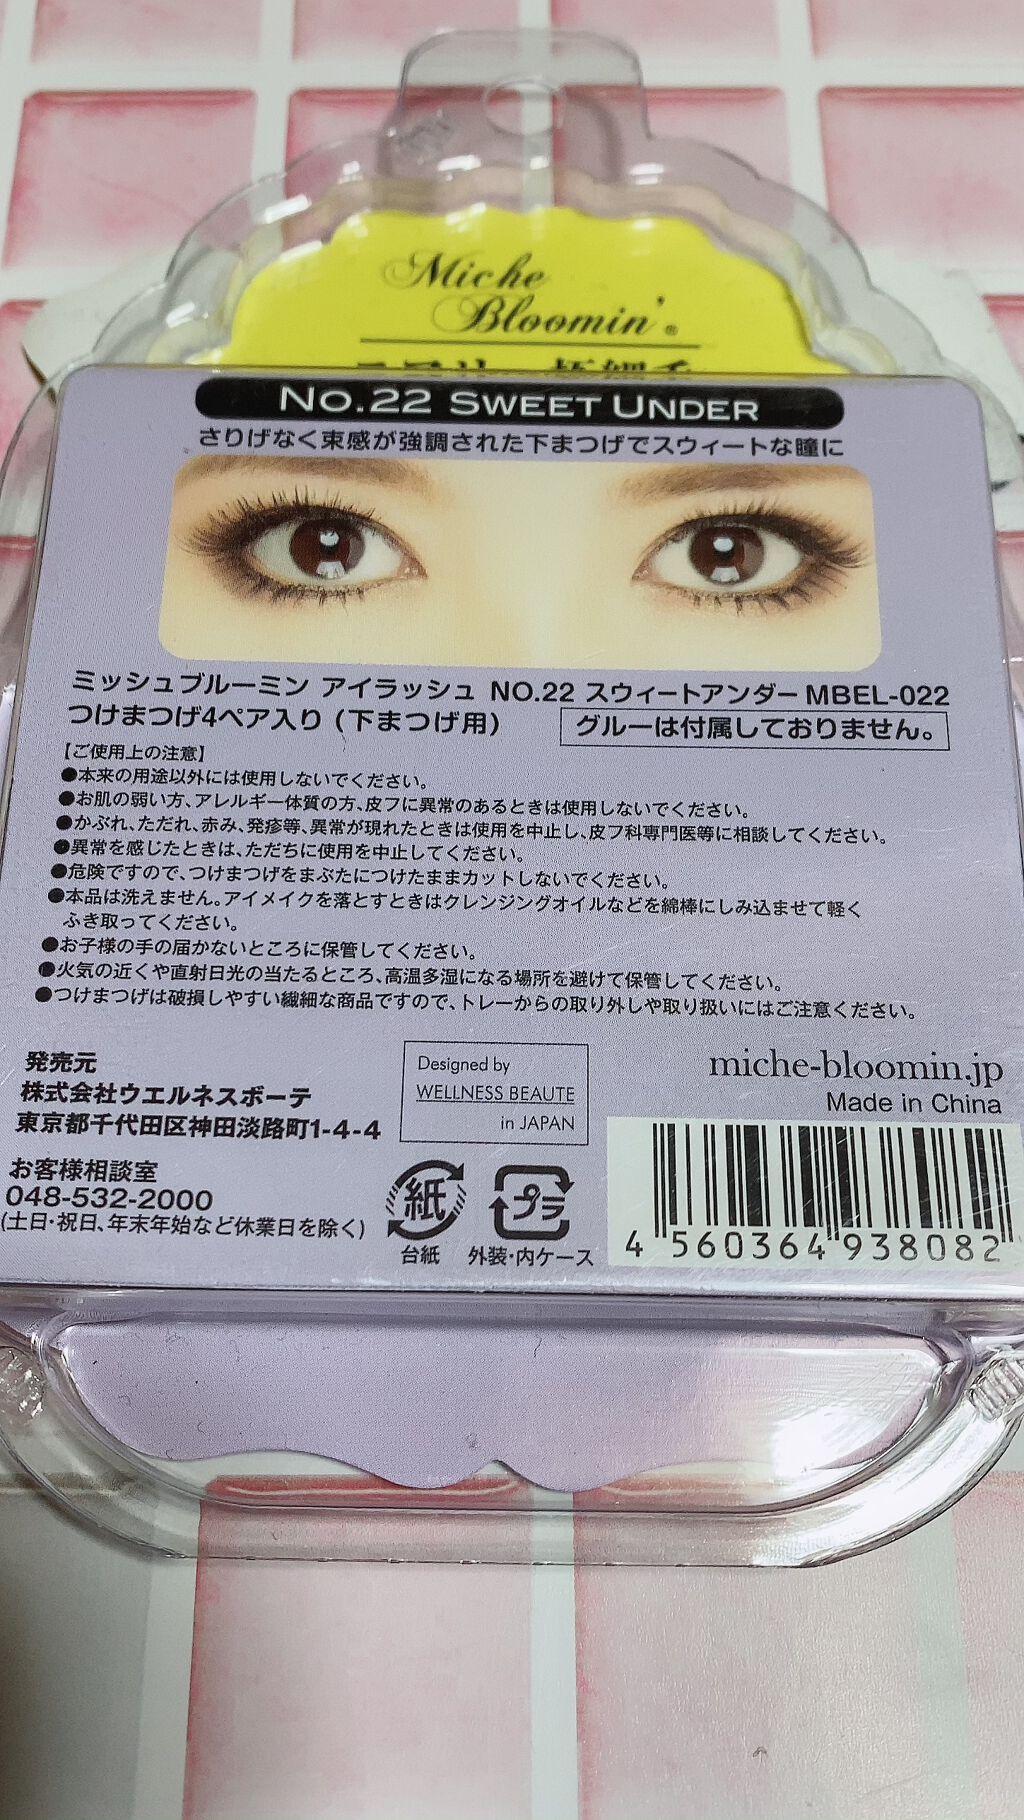 https://cdn.lipscosme.com/image/965d386deebf4956459399ff-1609061977-thumb.png